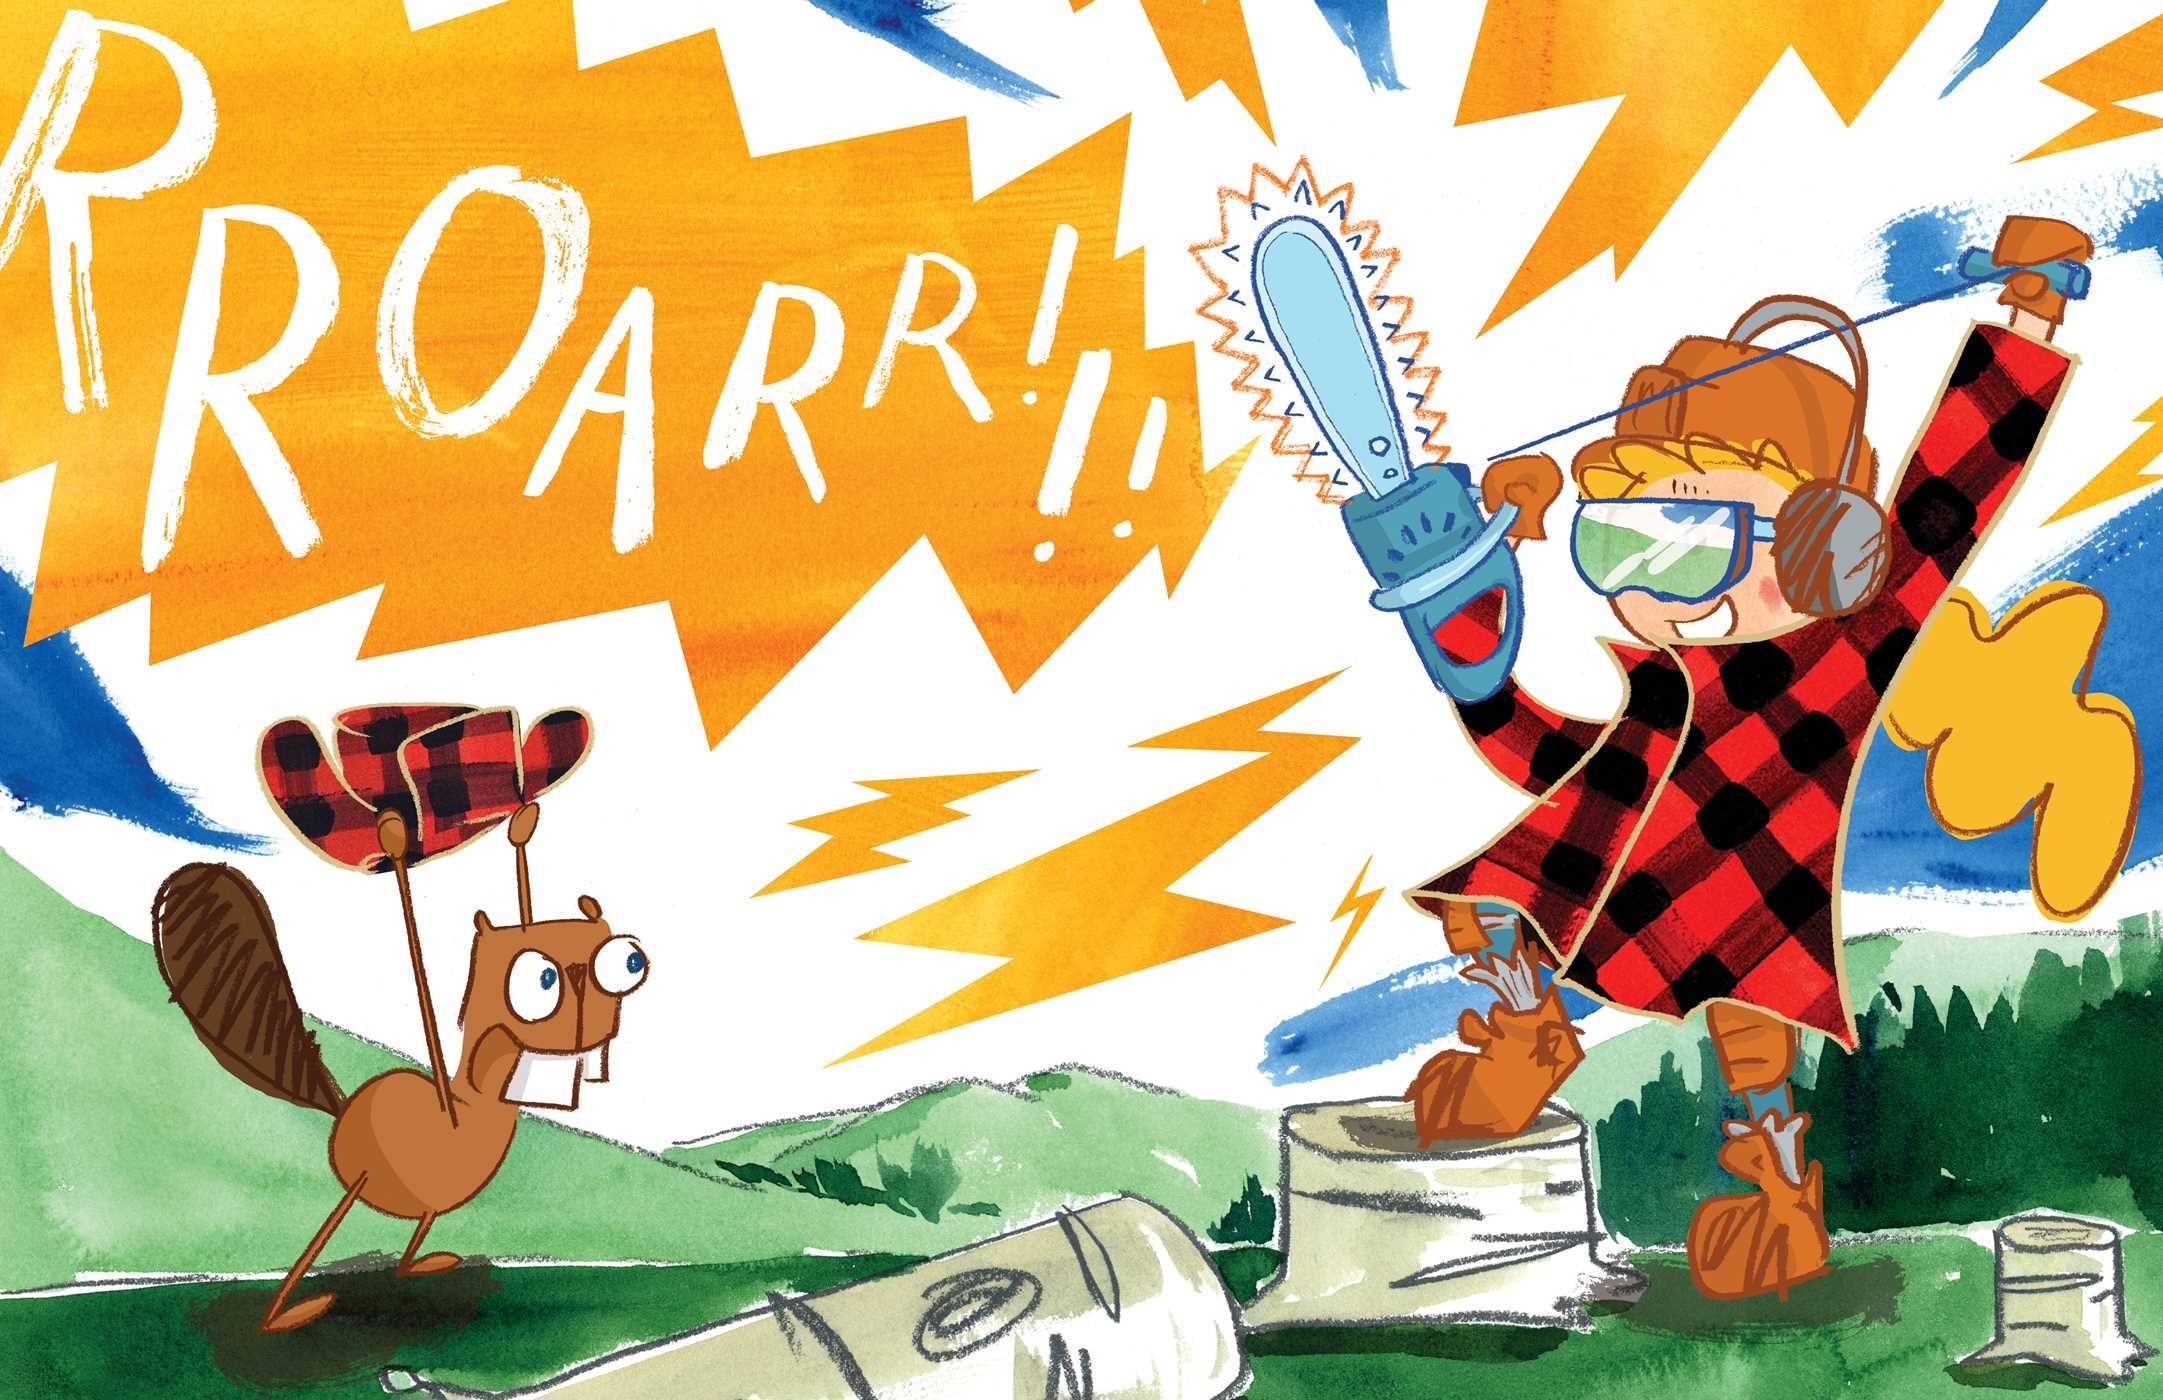 Fred the lumberjack 9781481429832.in03